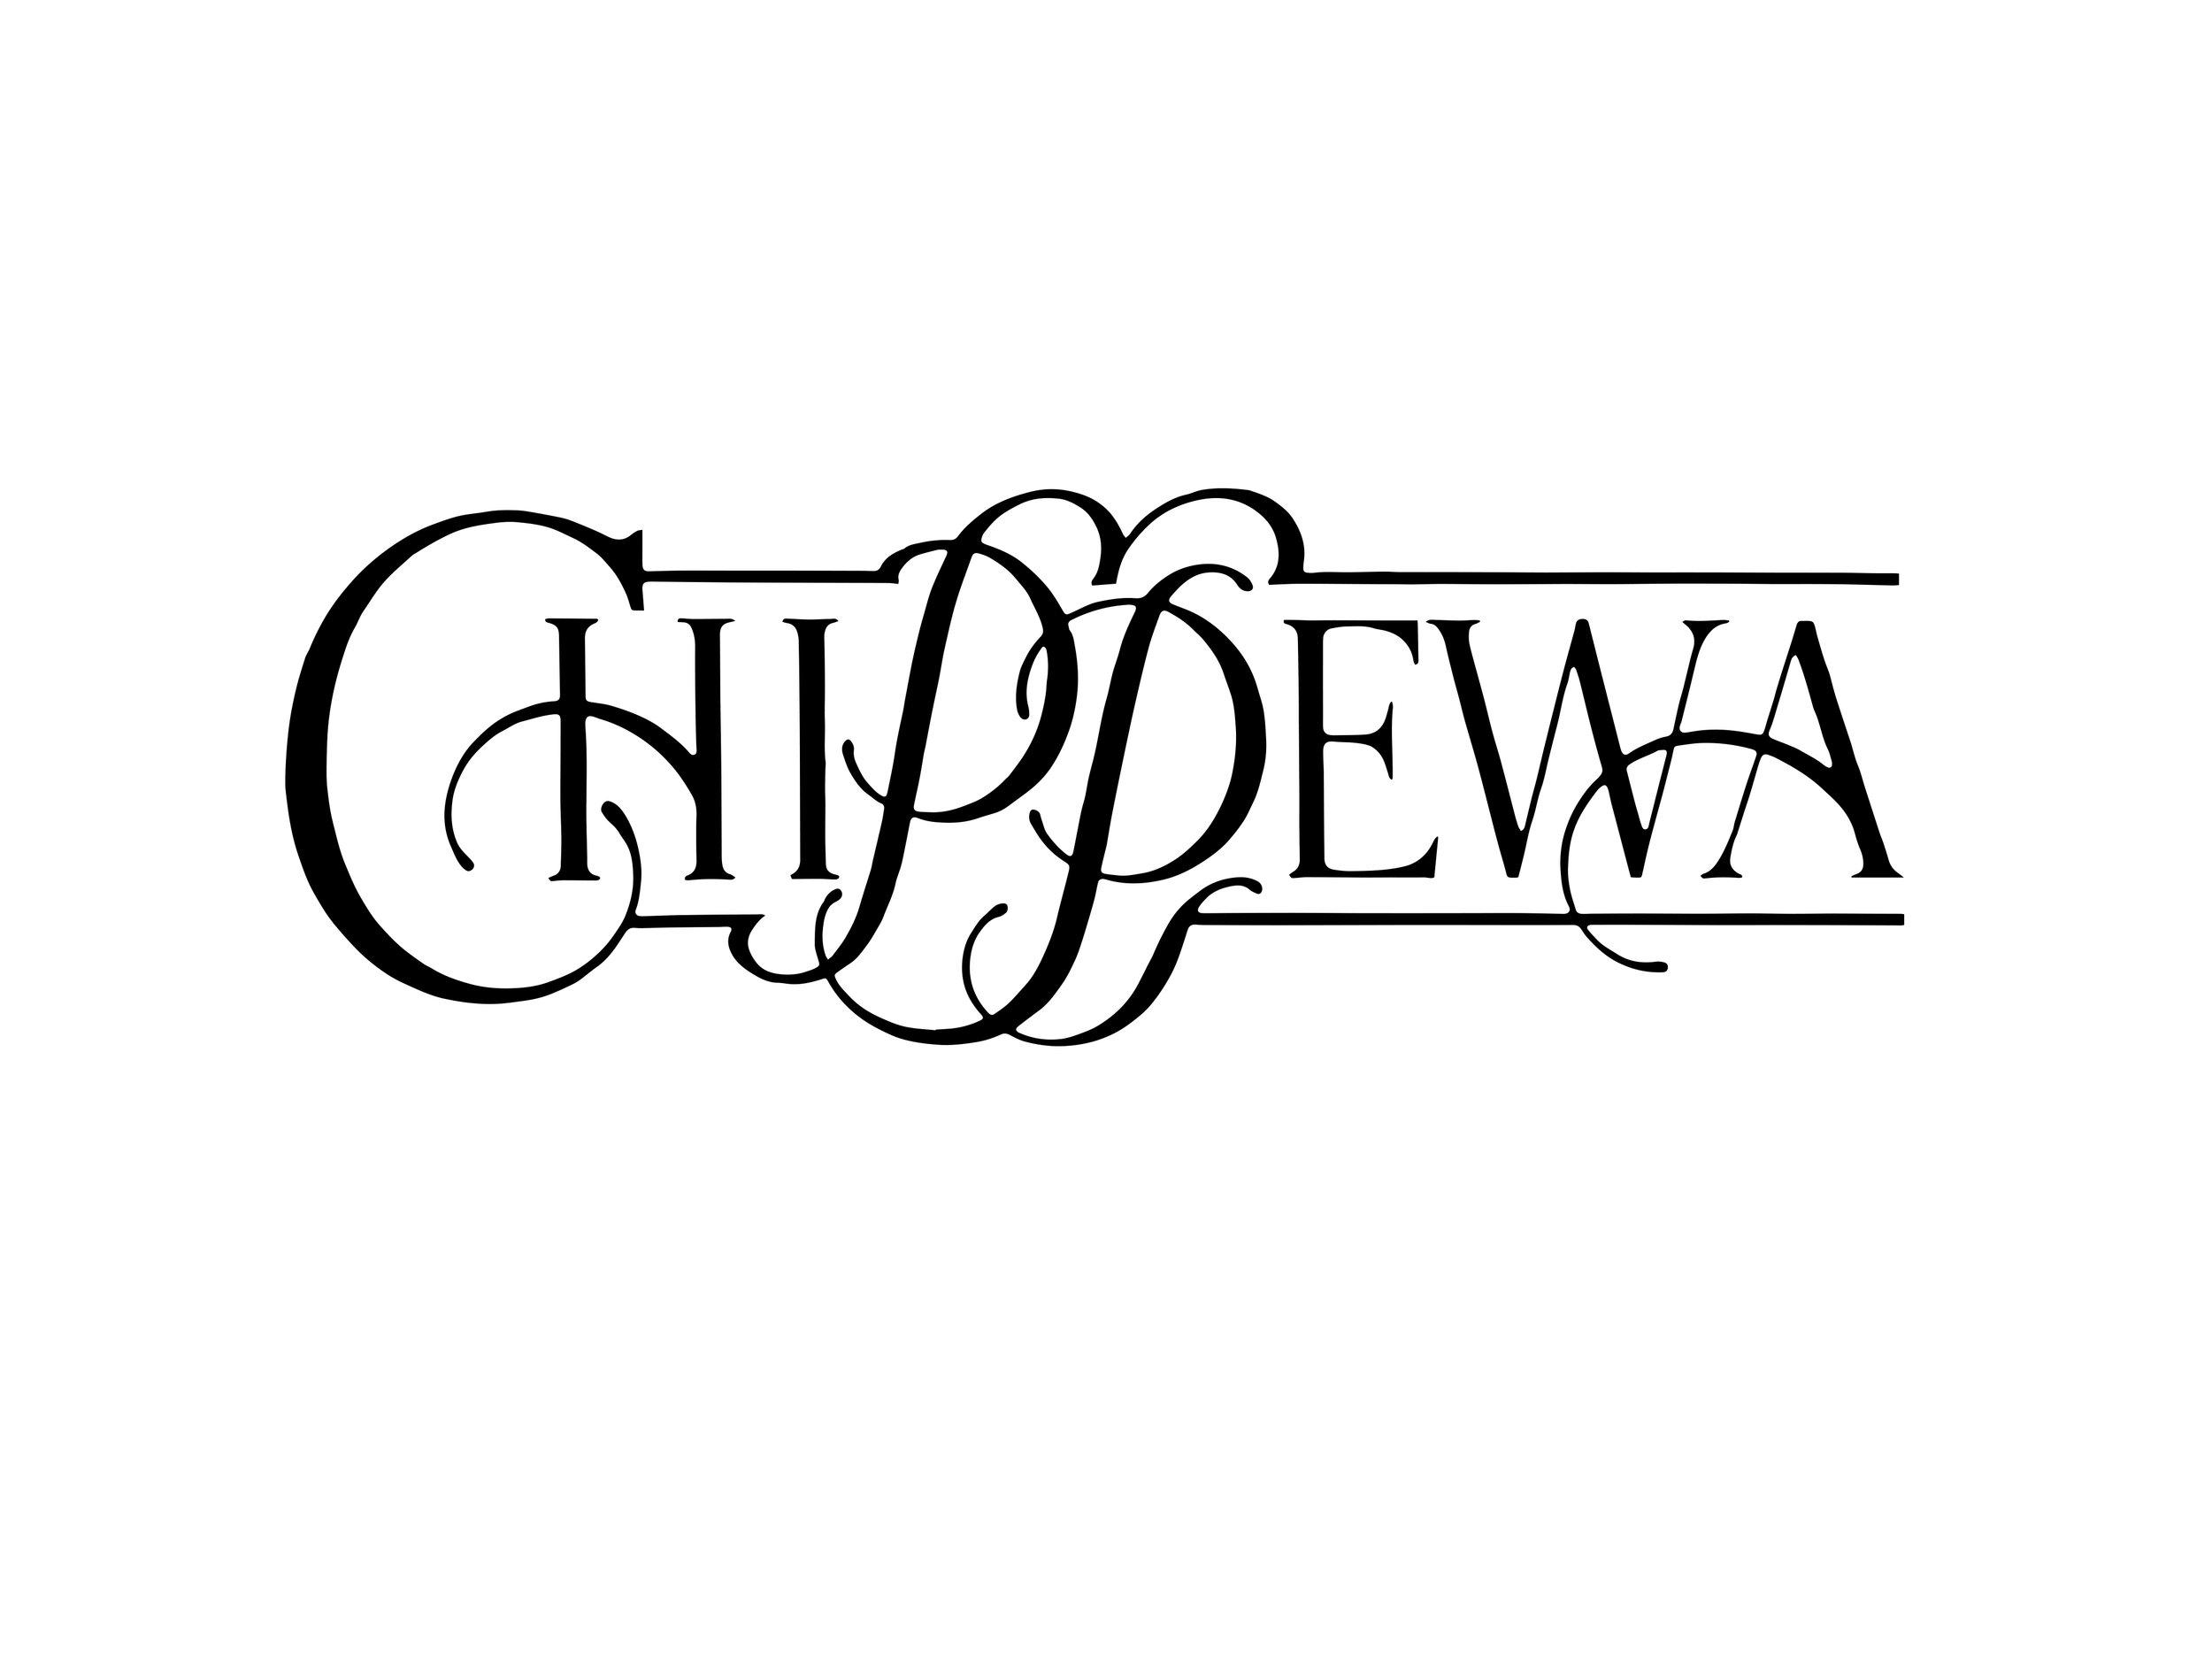 Whoville Chippewa Logo.jpg